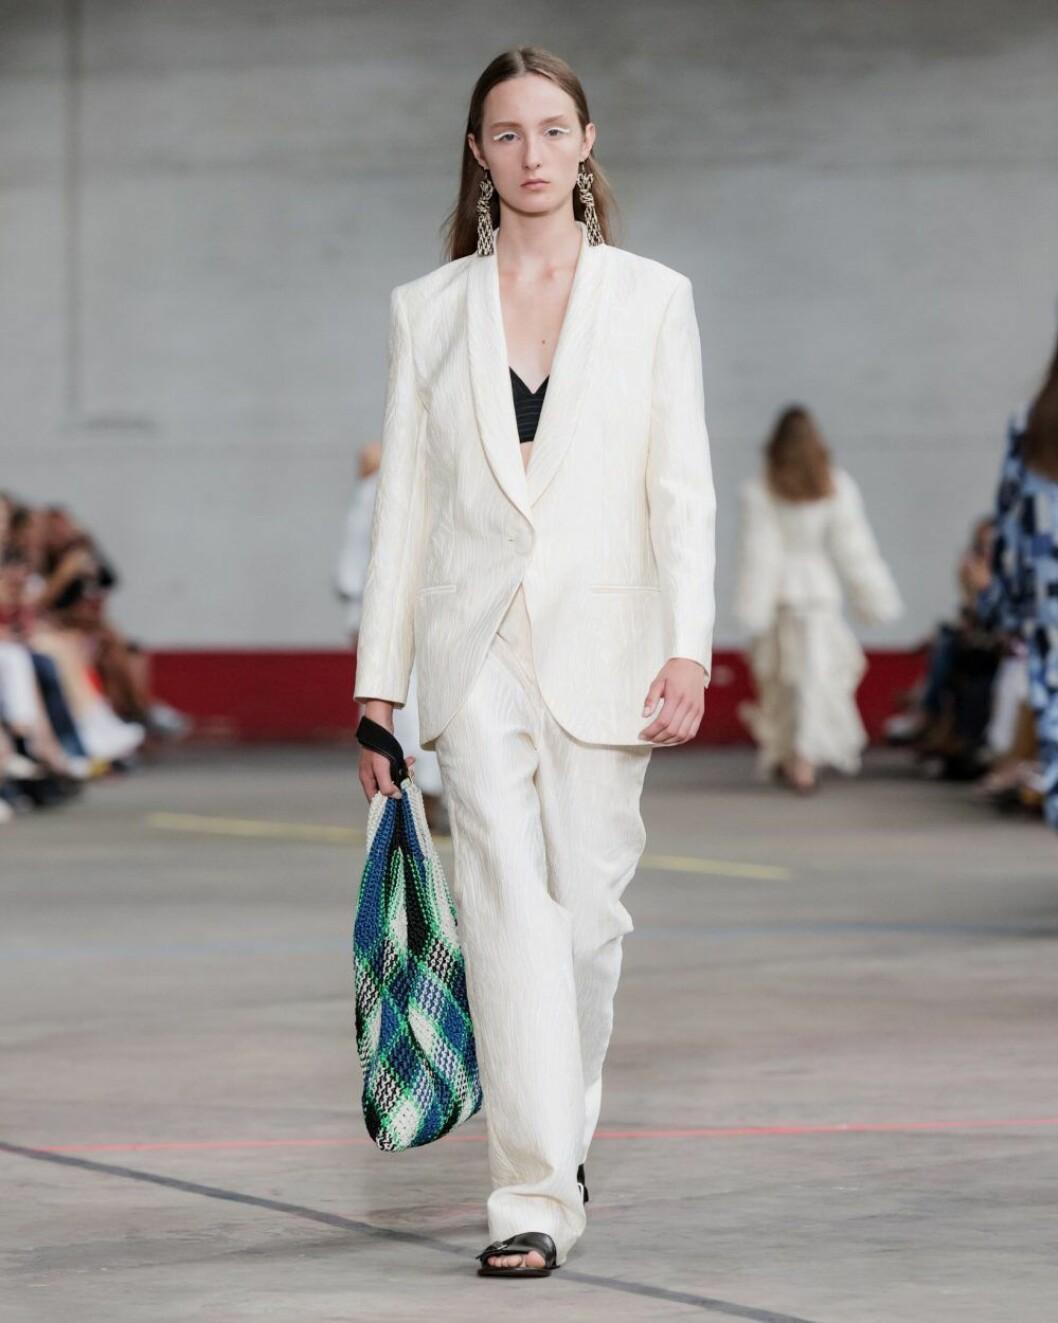 Vit kostym från By Malene Birgers kläduthyrning i Sverige